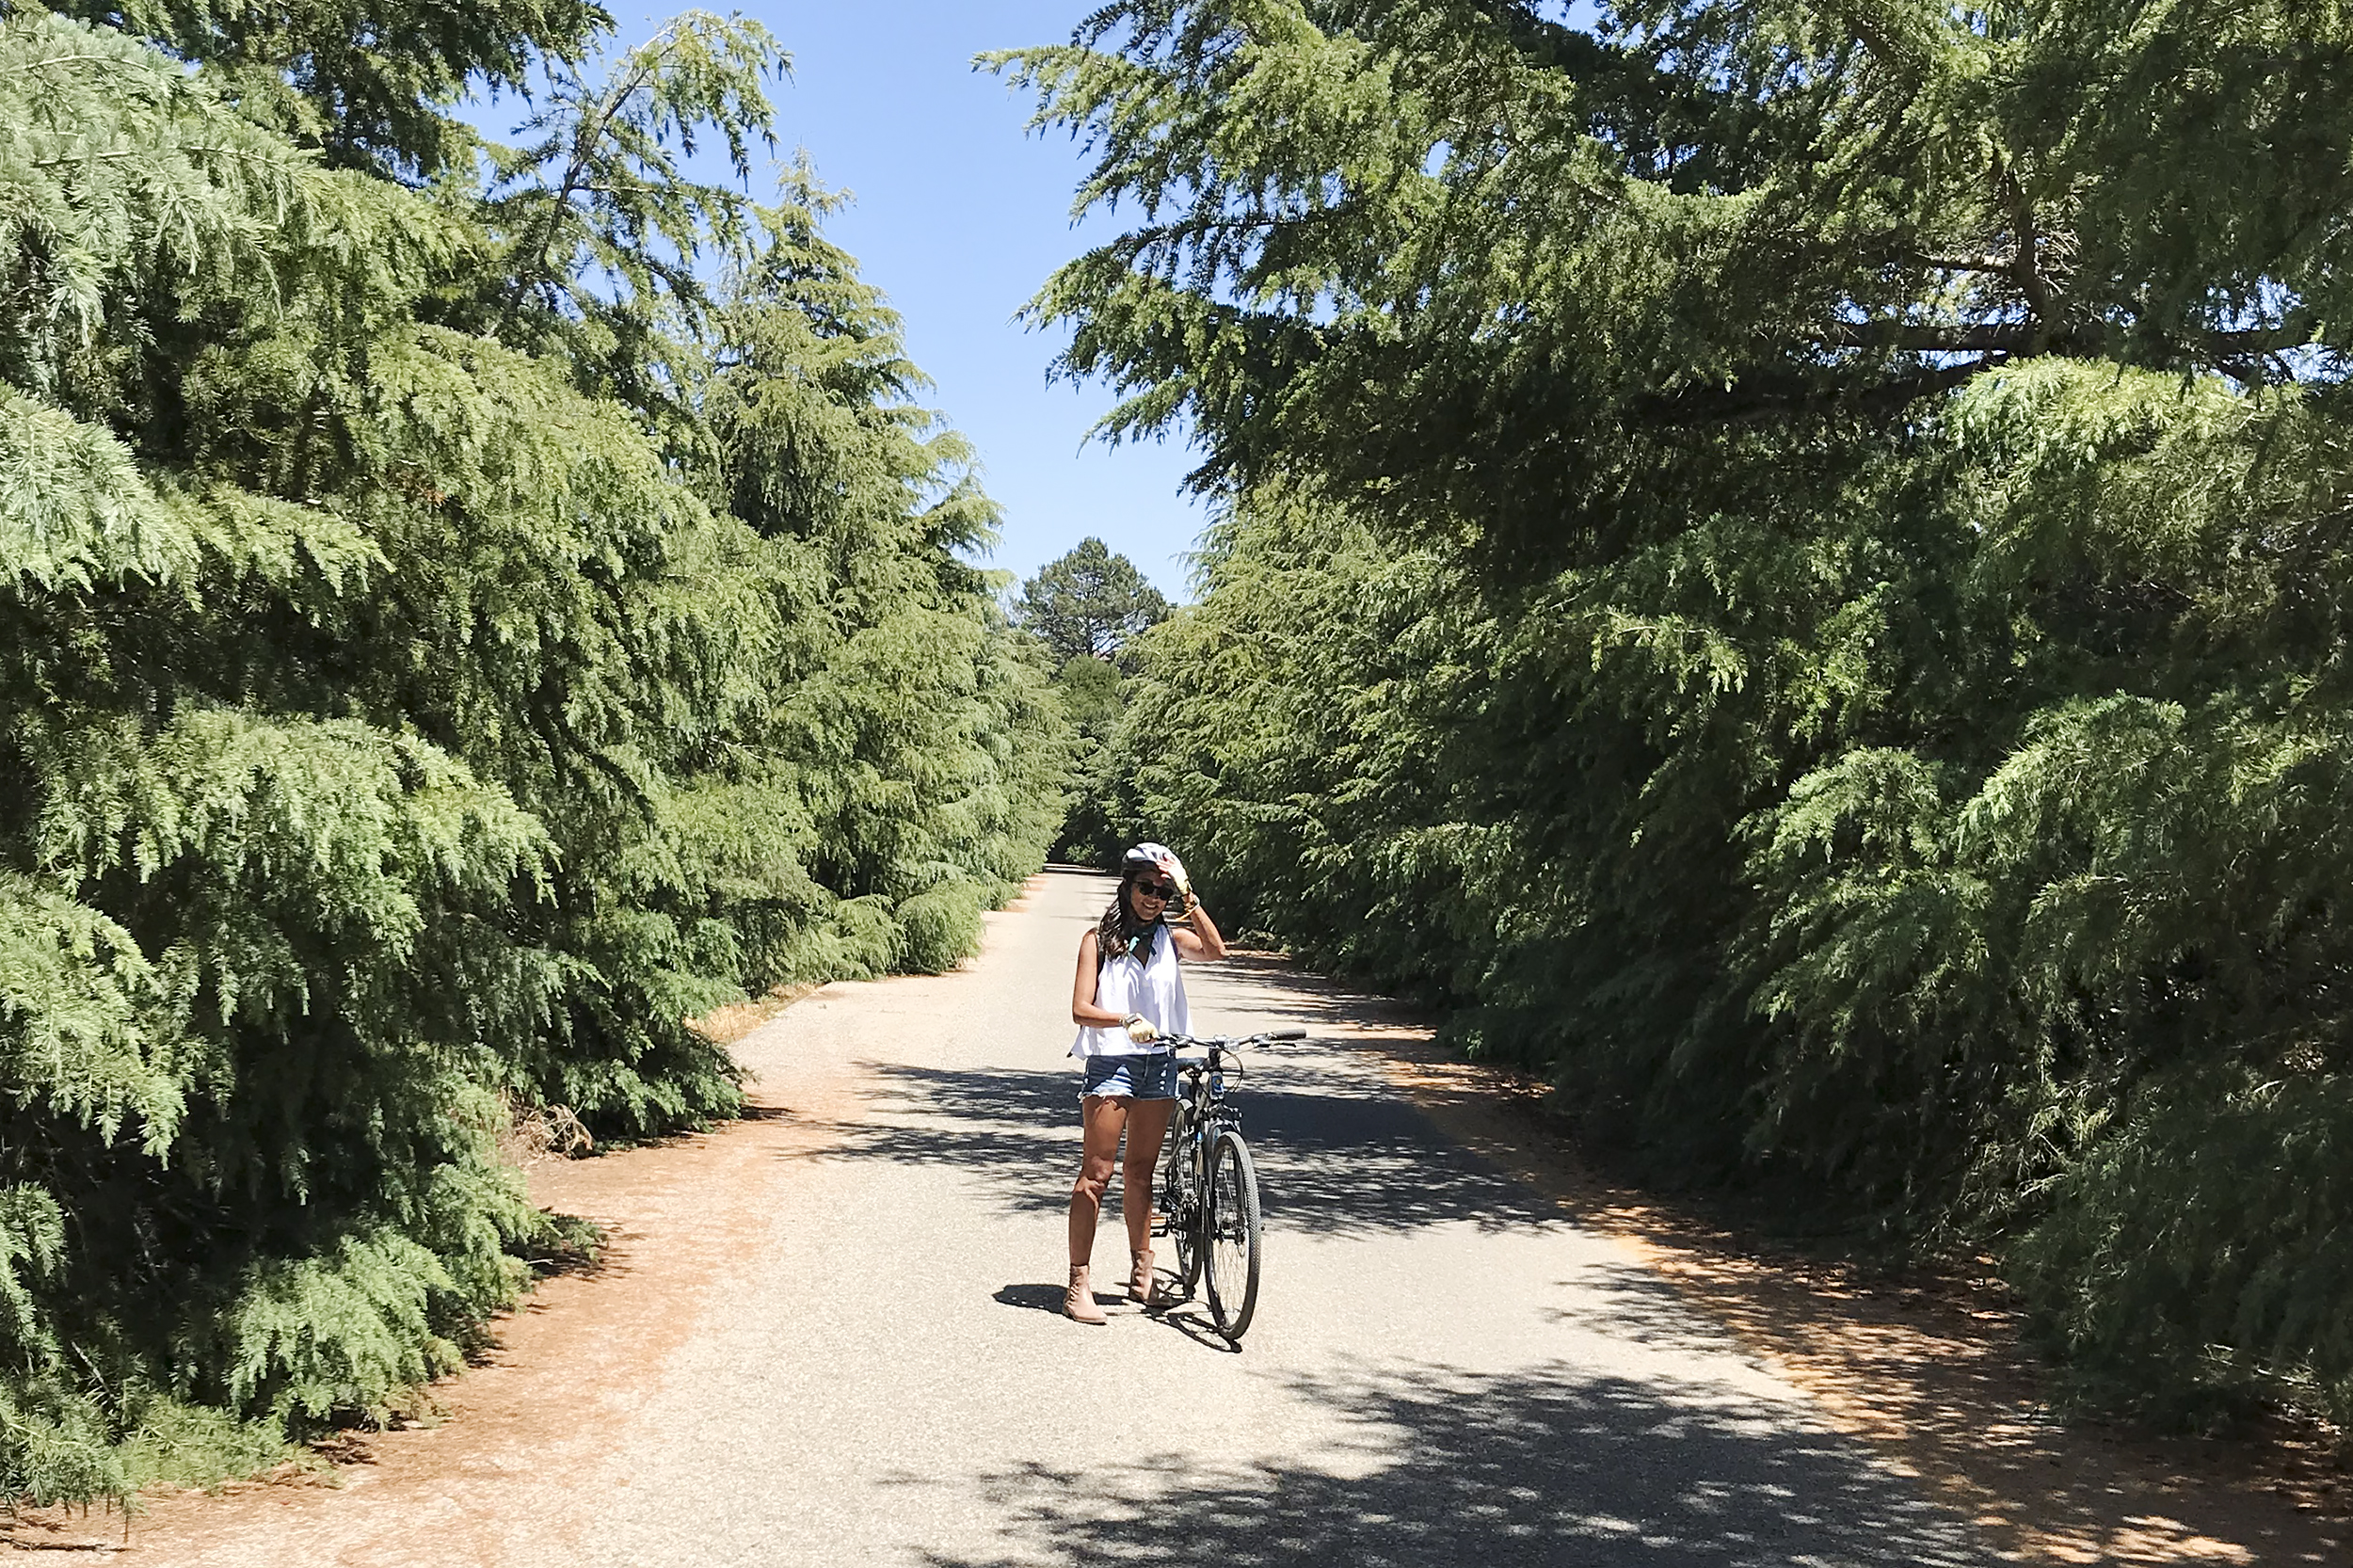 chrissihernandez-california-santaynez-biking-01copy2500.jpg